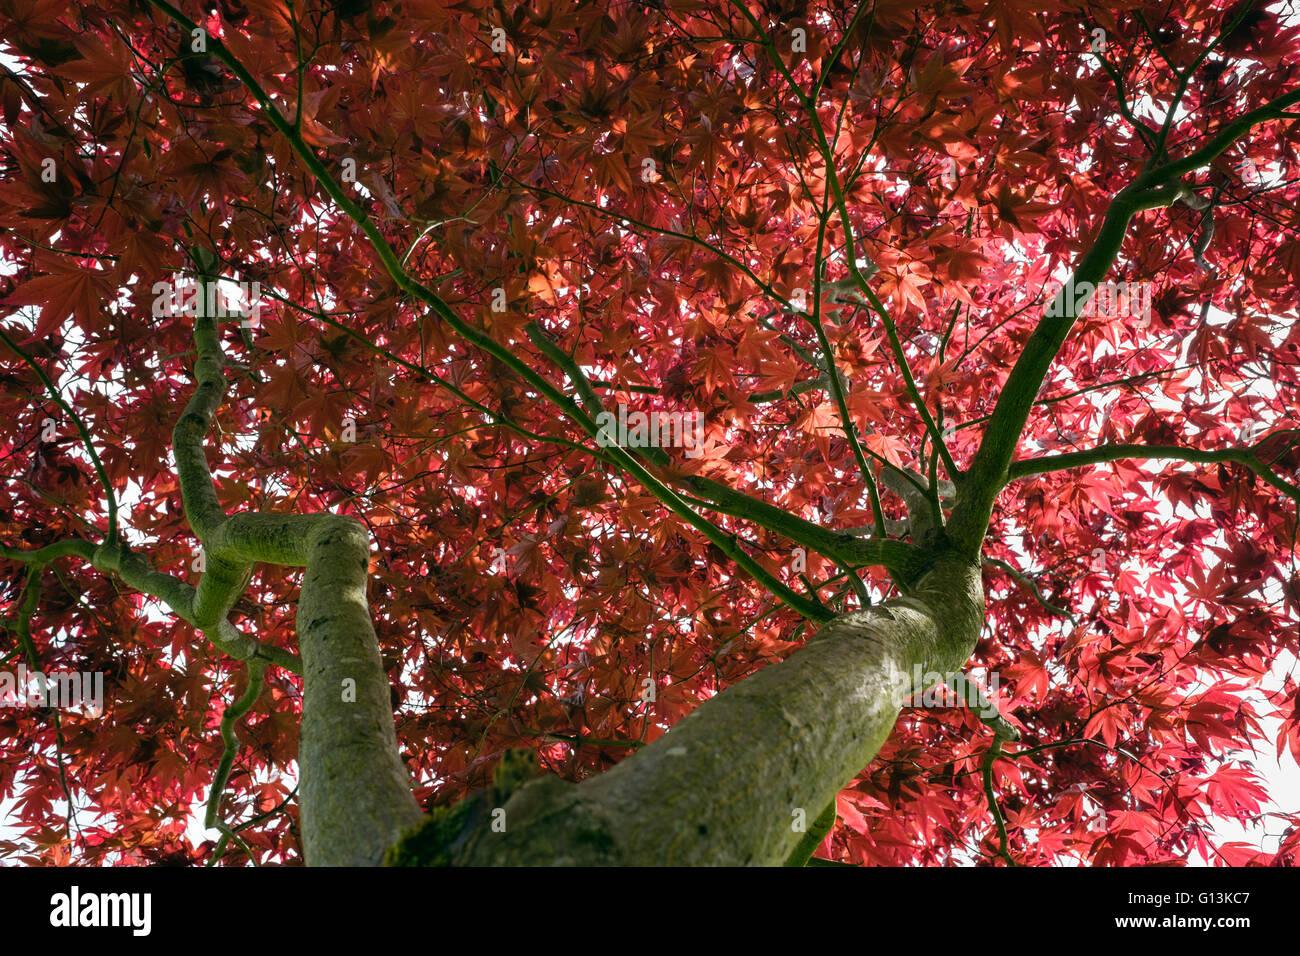 "Rosse foglie di acero giapponese Acer palmatum Atropurpureum ""' visto da sotto con inizio estate fogliame Immagini Stock"